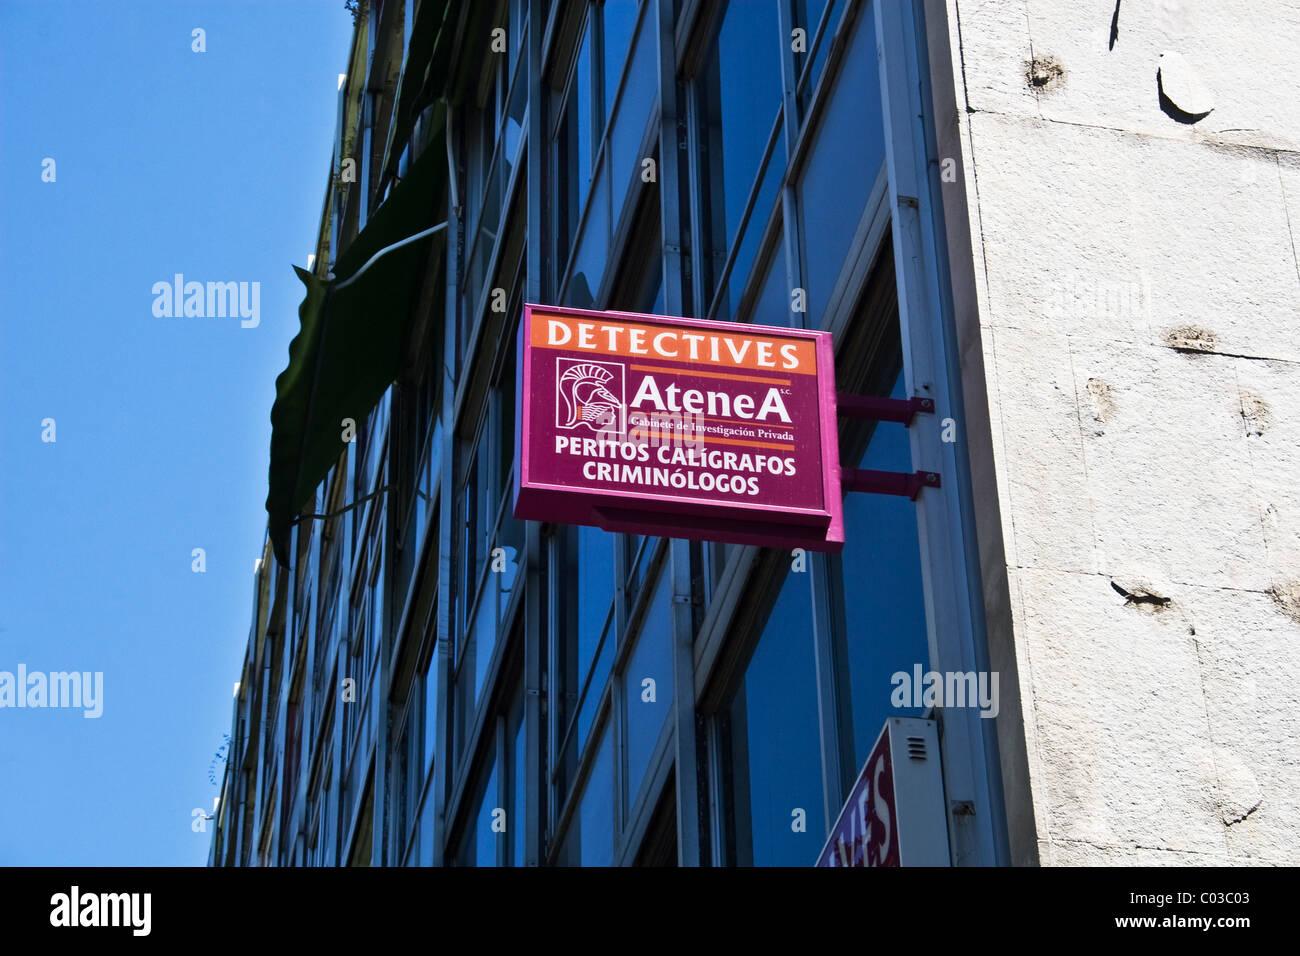 Detective agency, Cordoba, Andalucia, Spain - Stock Image